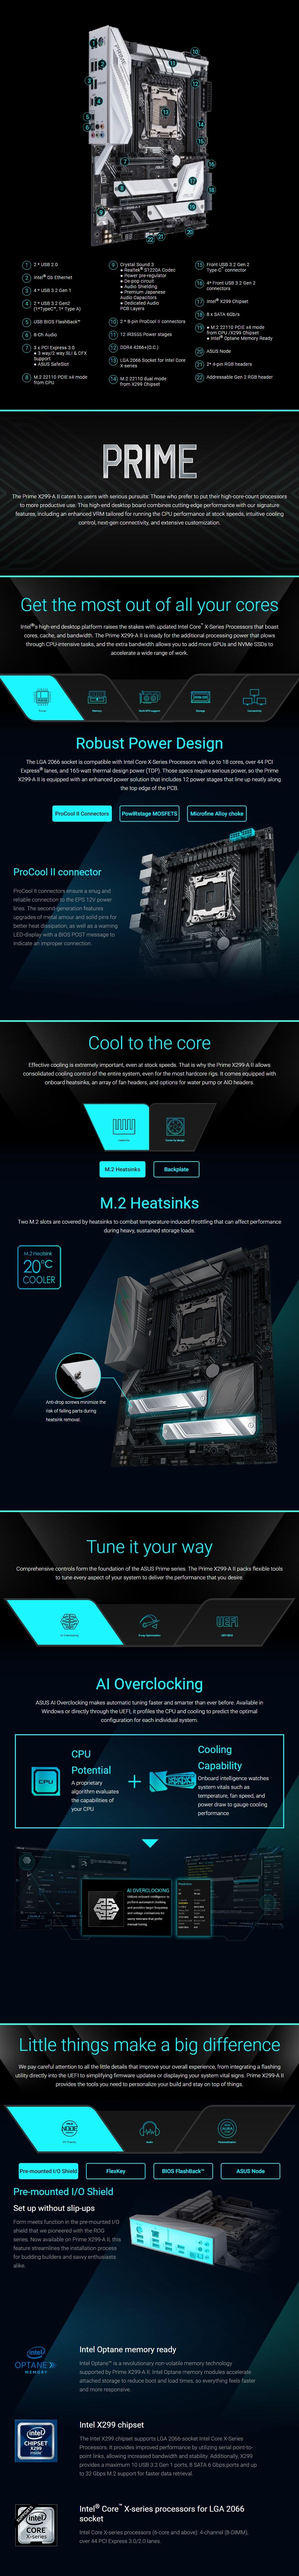 asus-prime-x299a-ii-lga-2066-atx-motherboard-ac28300-6.jpg